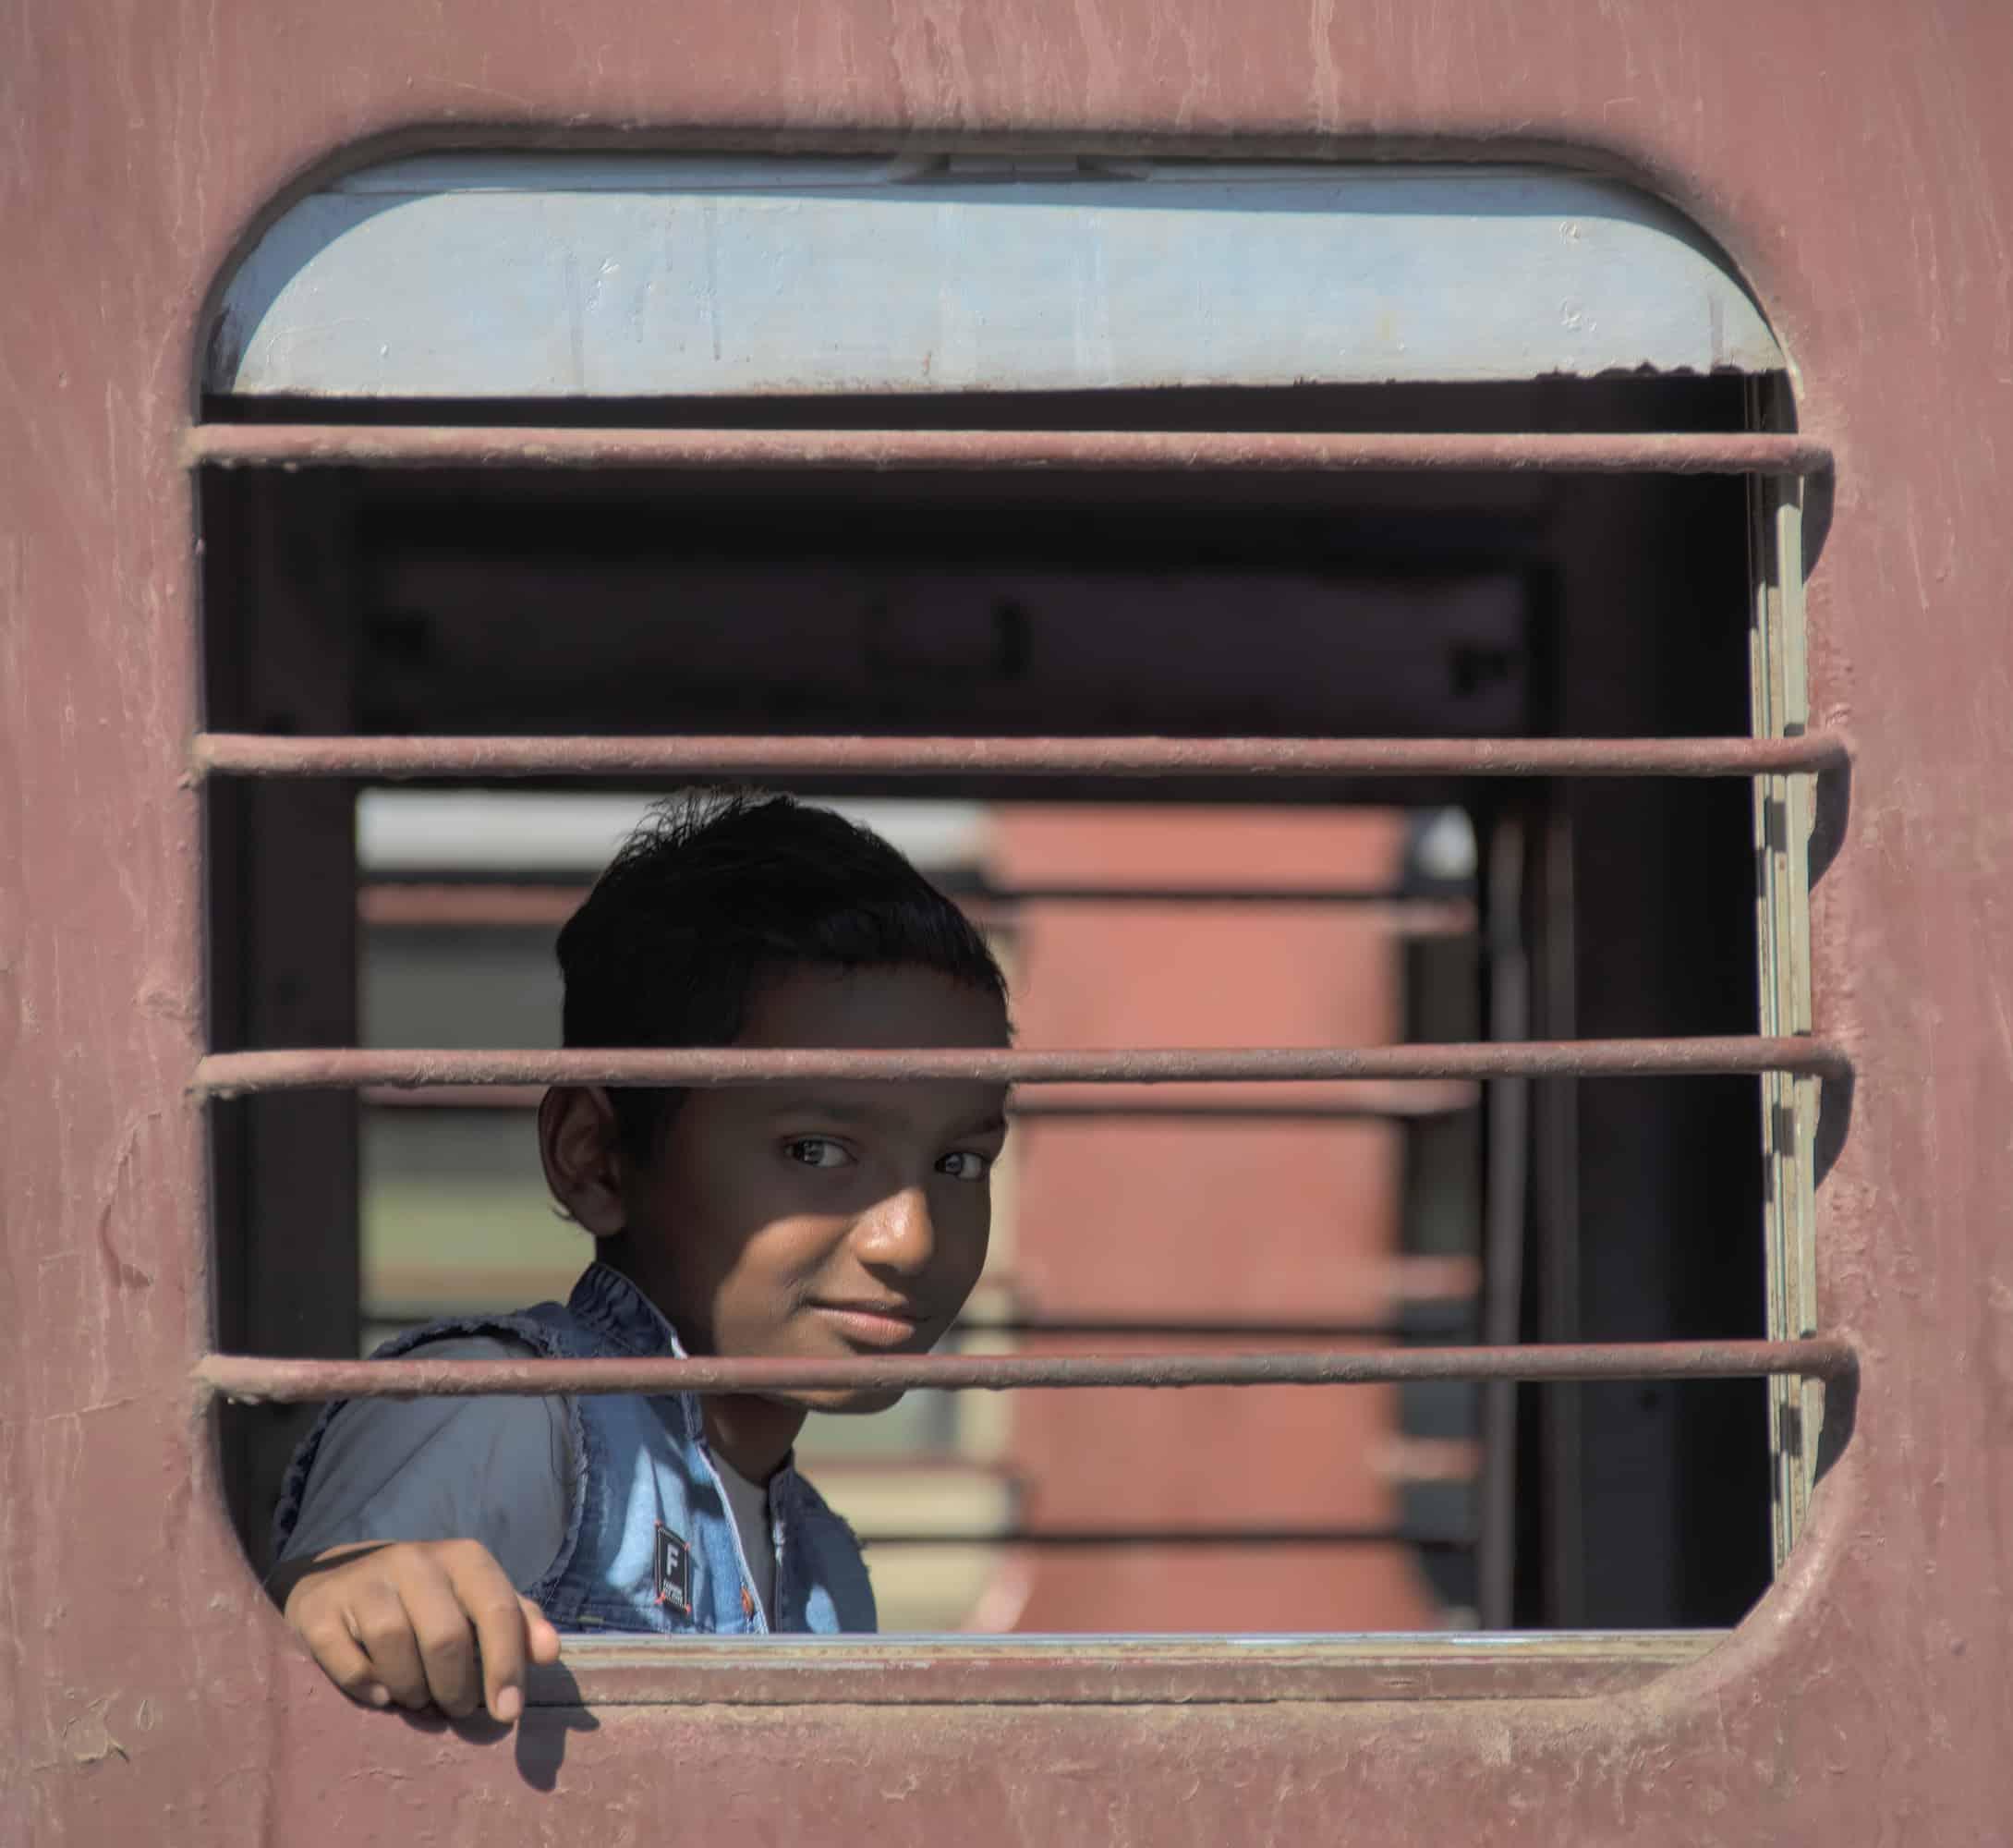 Boy on a train in India